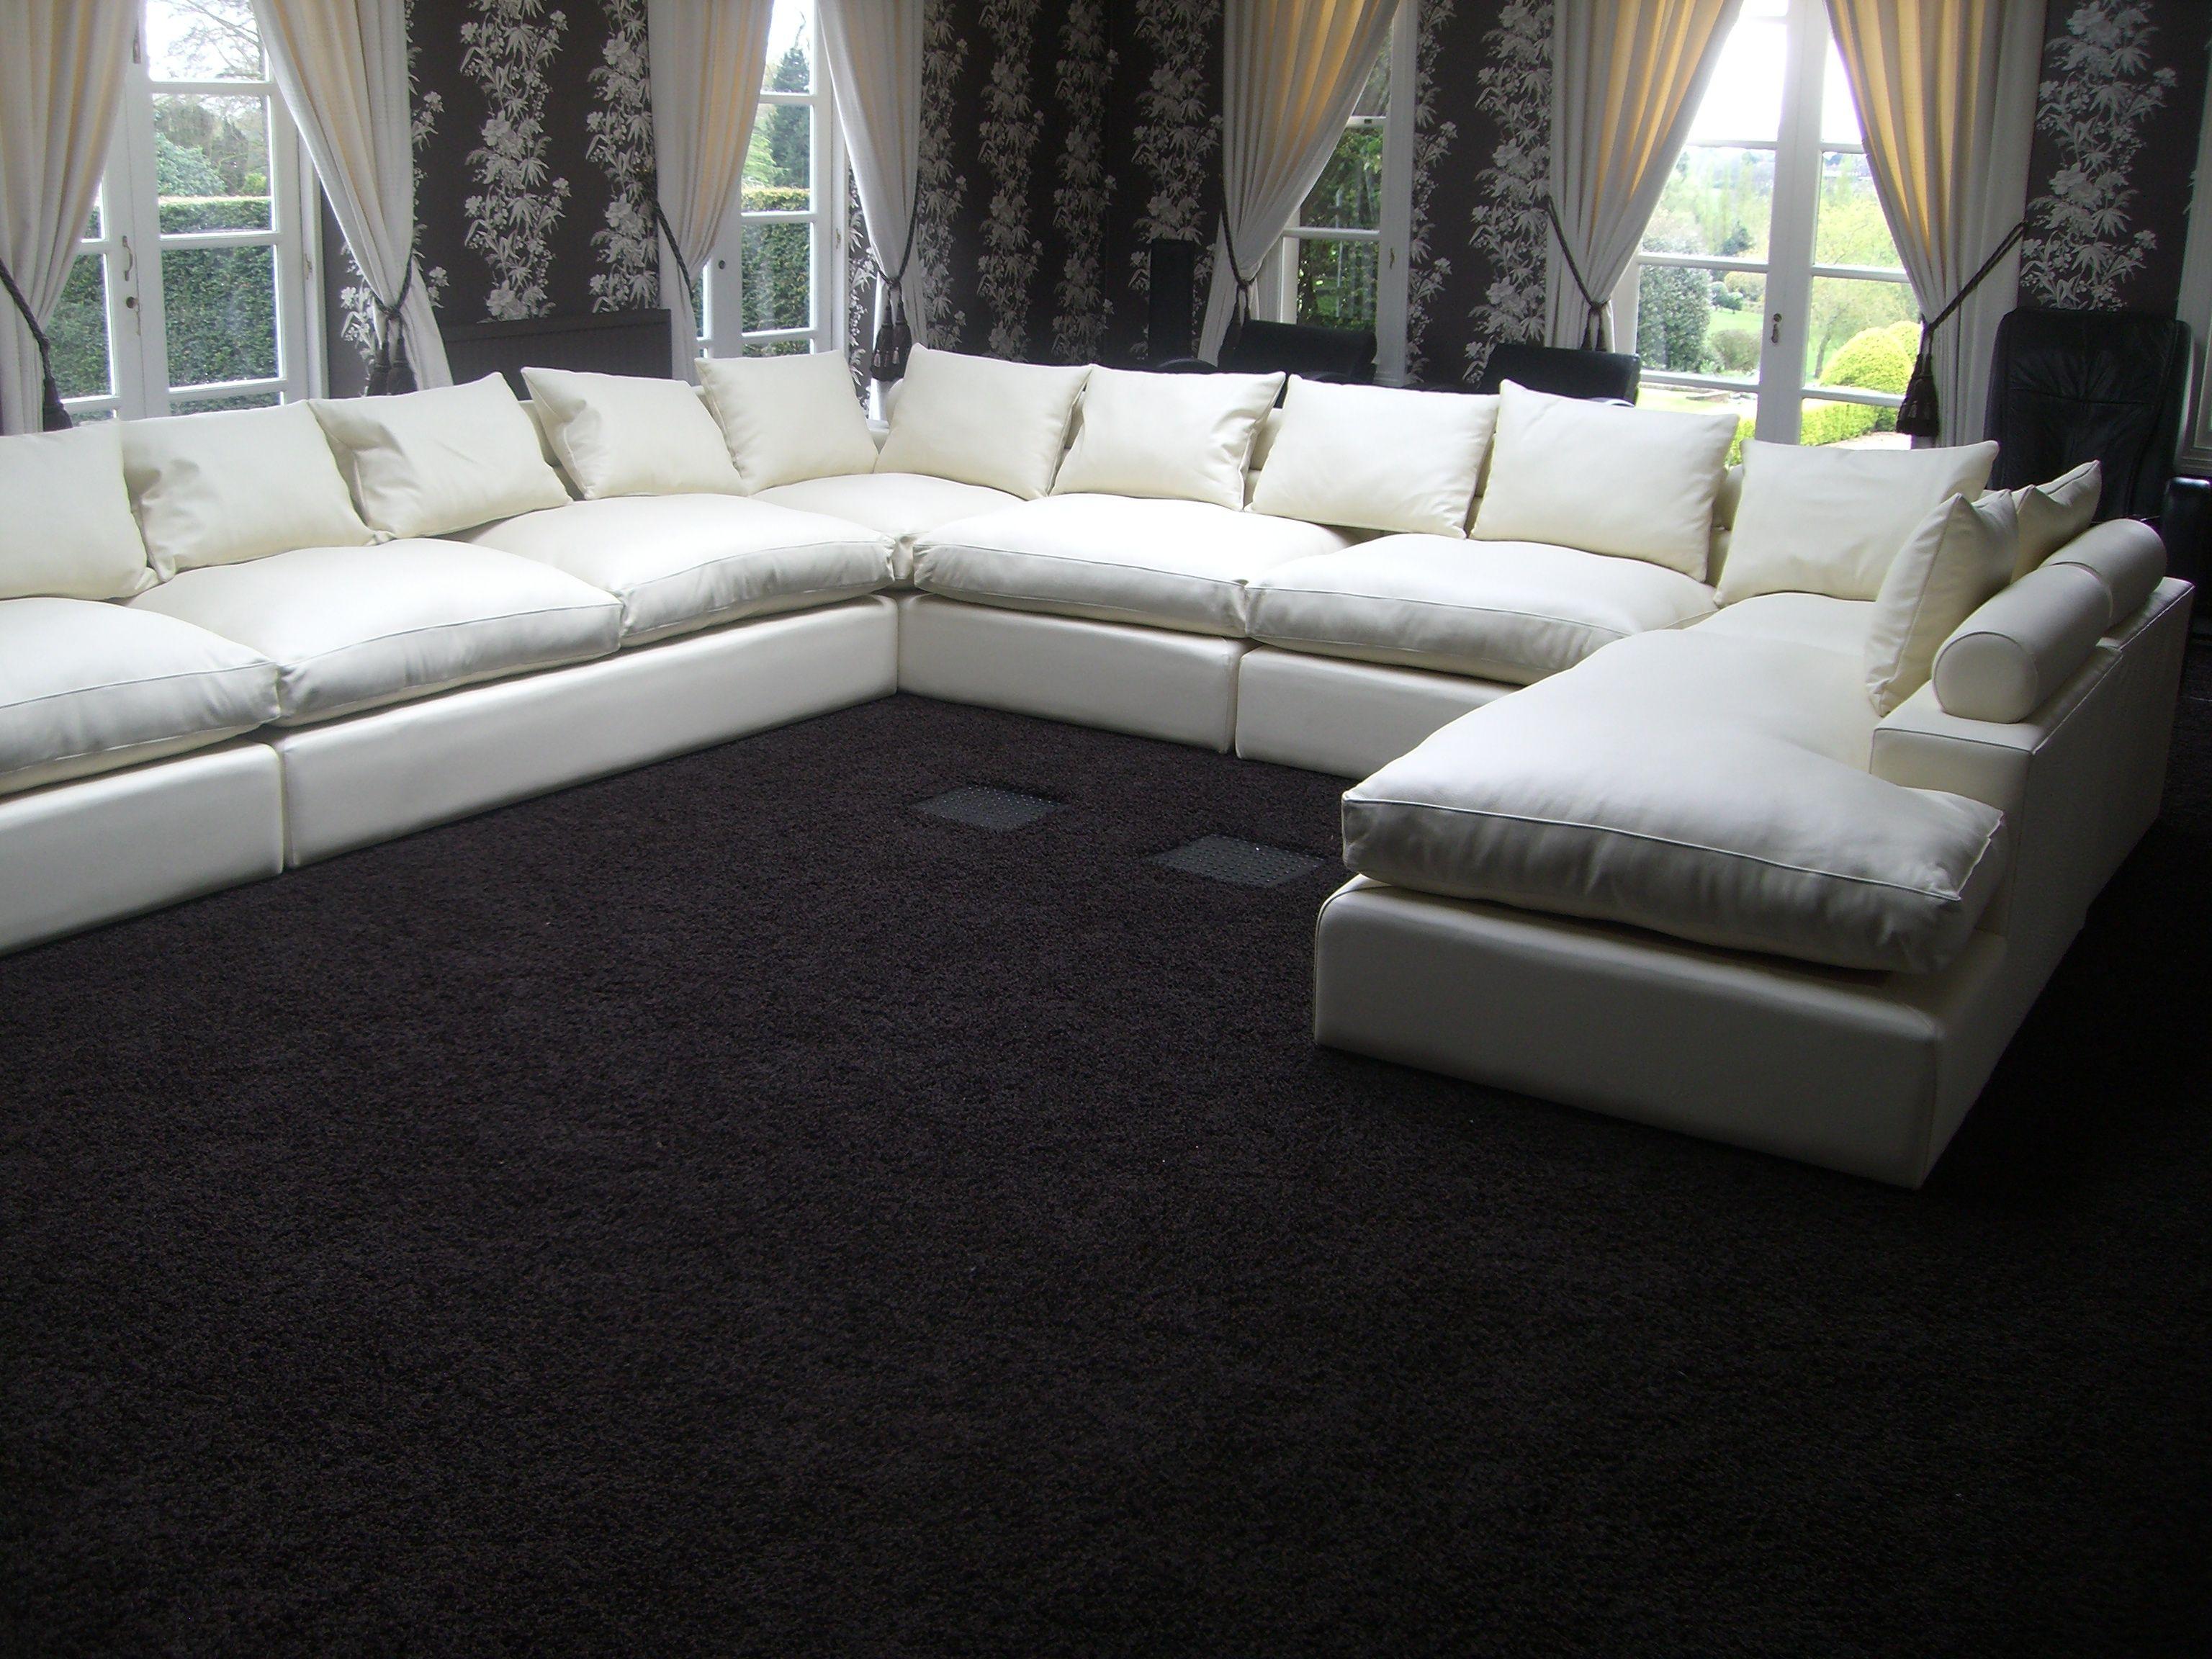 Avignon Modular U-Shaped Sofa | U shaped sofa, White